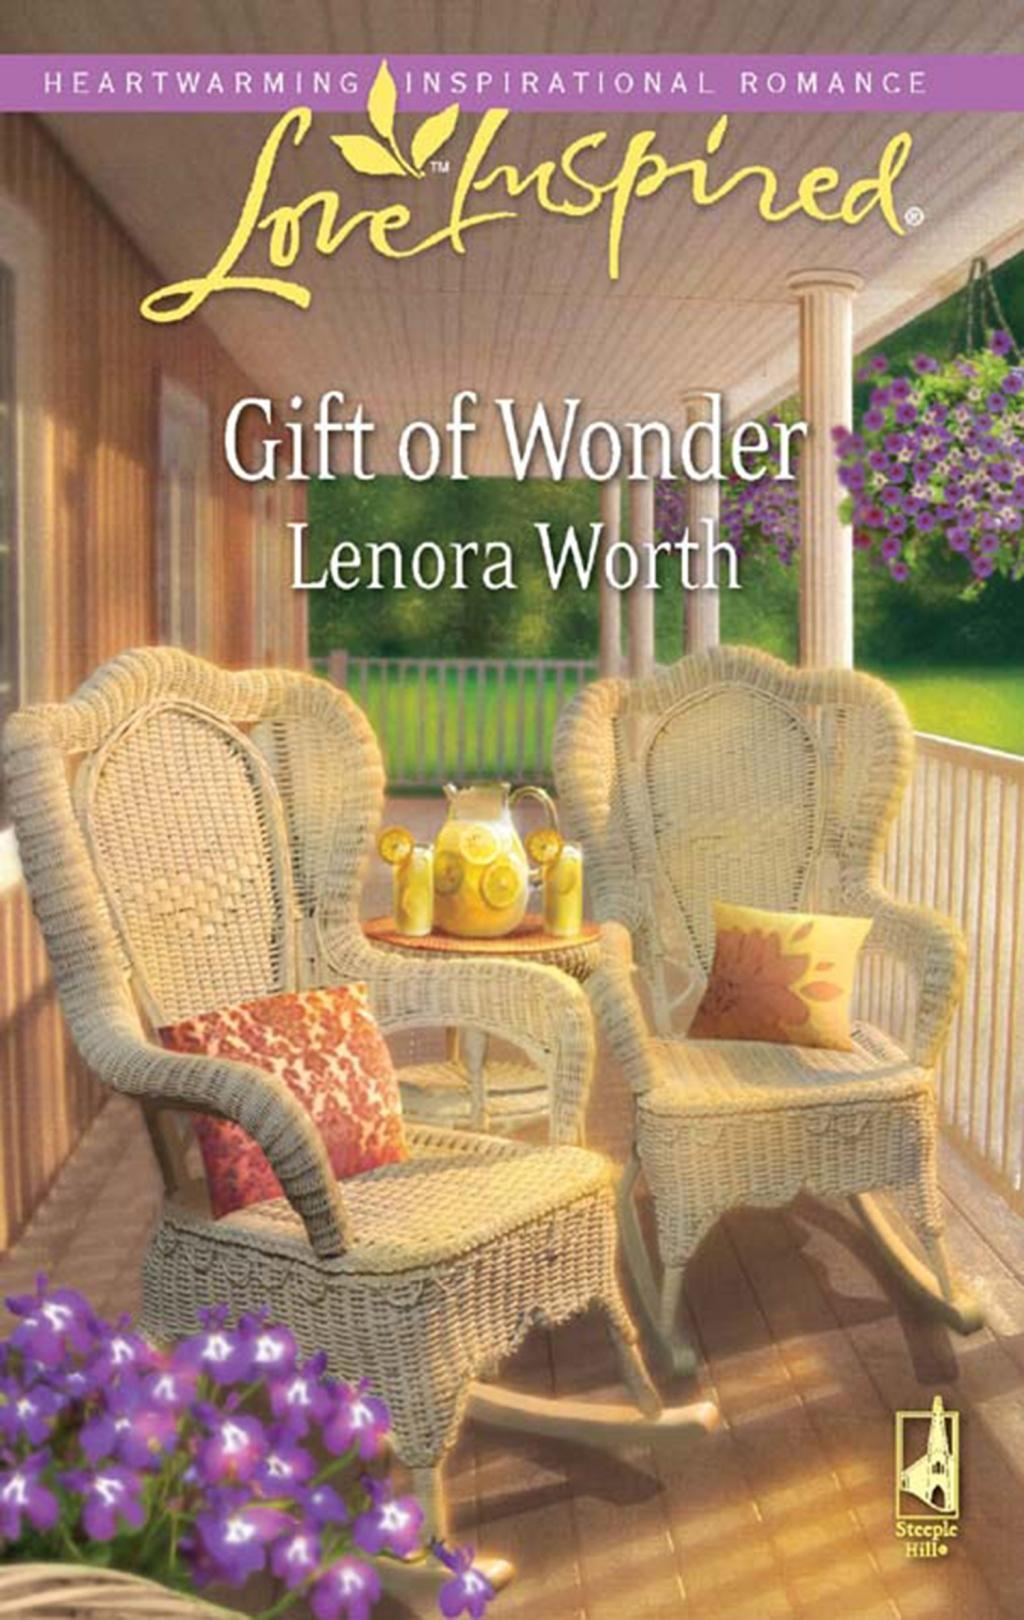 Gift of Wonder (Mills & Boon Love Inspired)